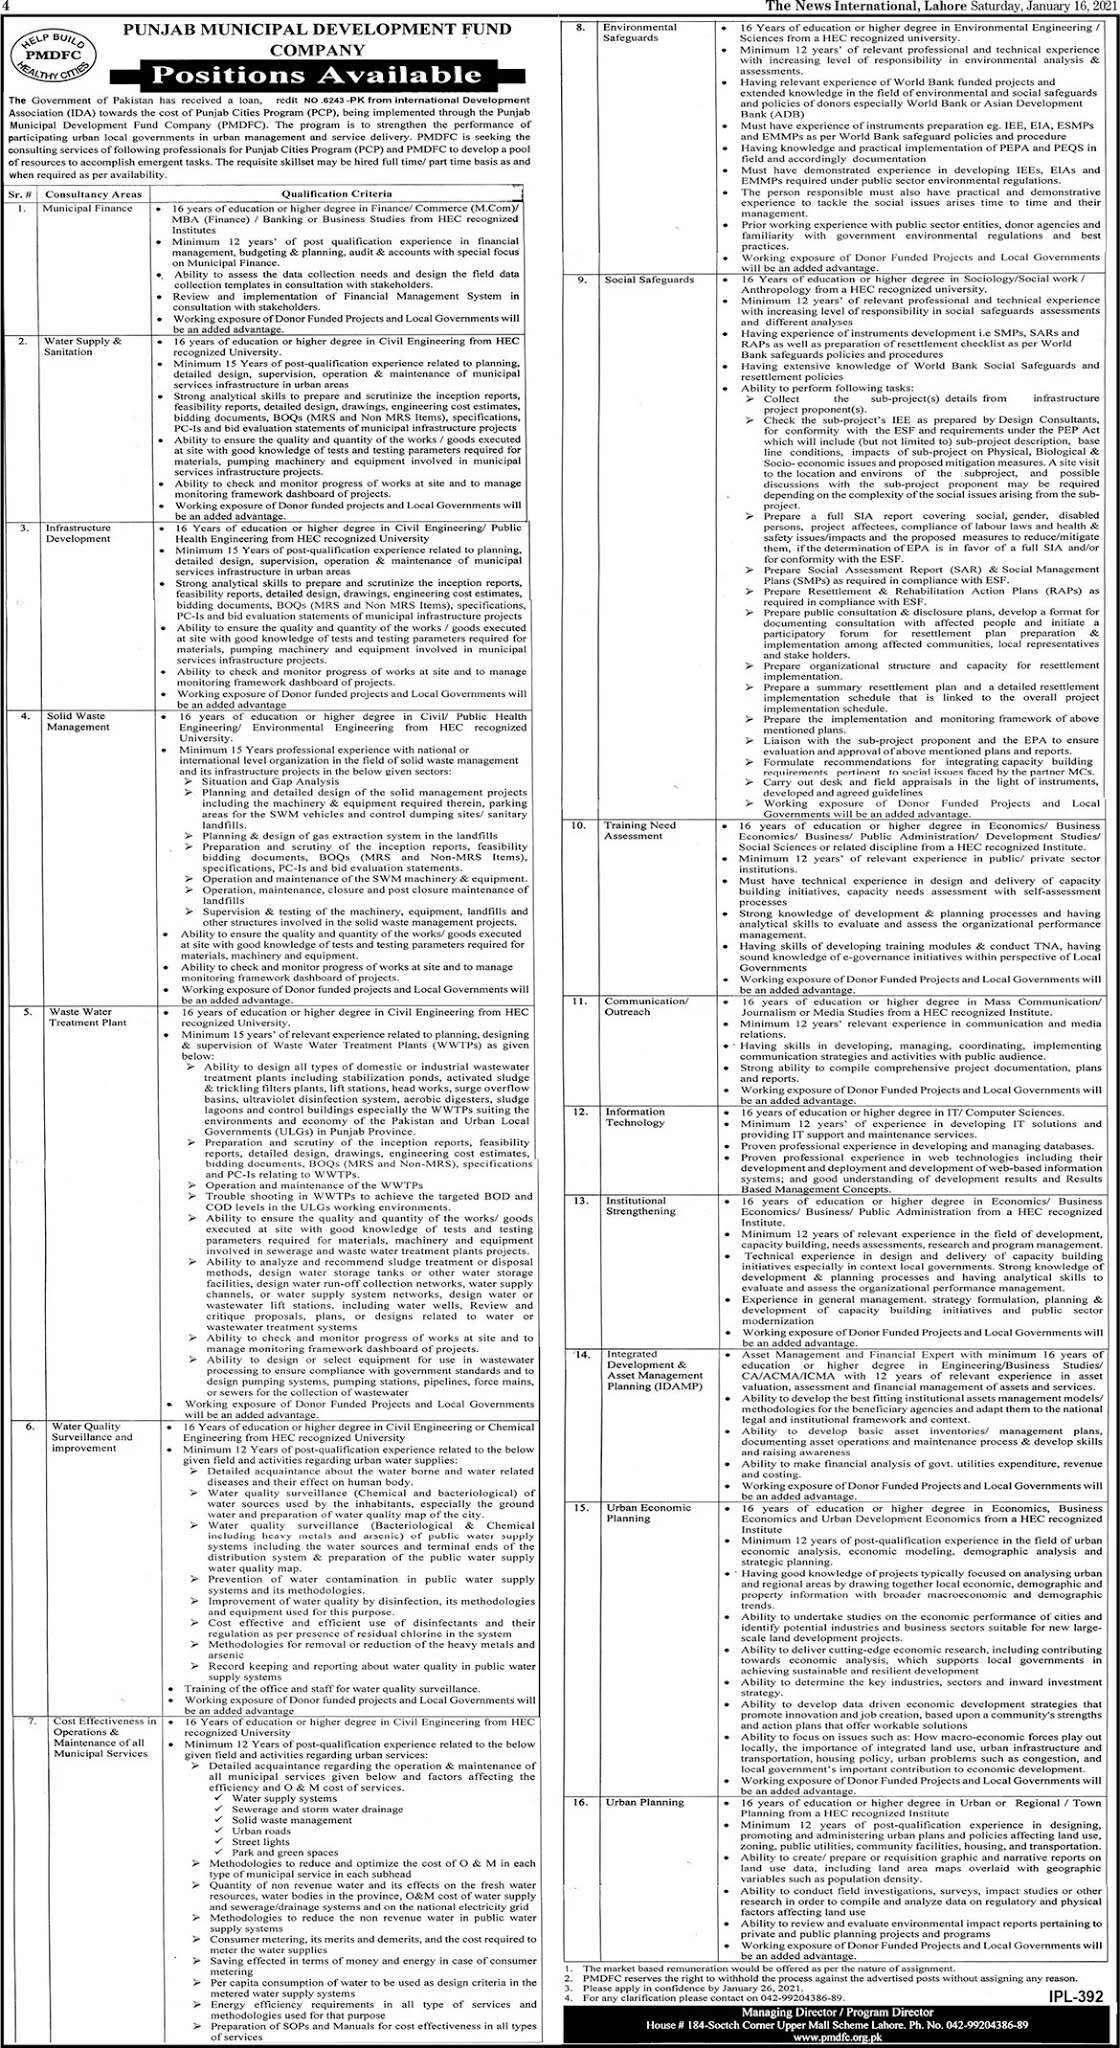 Latest Punjab Municipal Development Fund Company (PMDFC) Jobs 2021